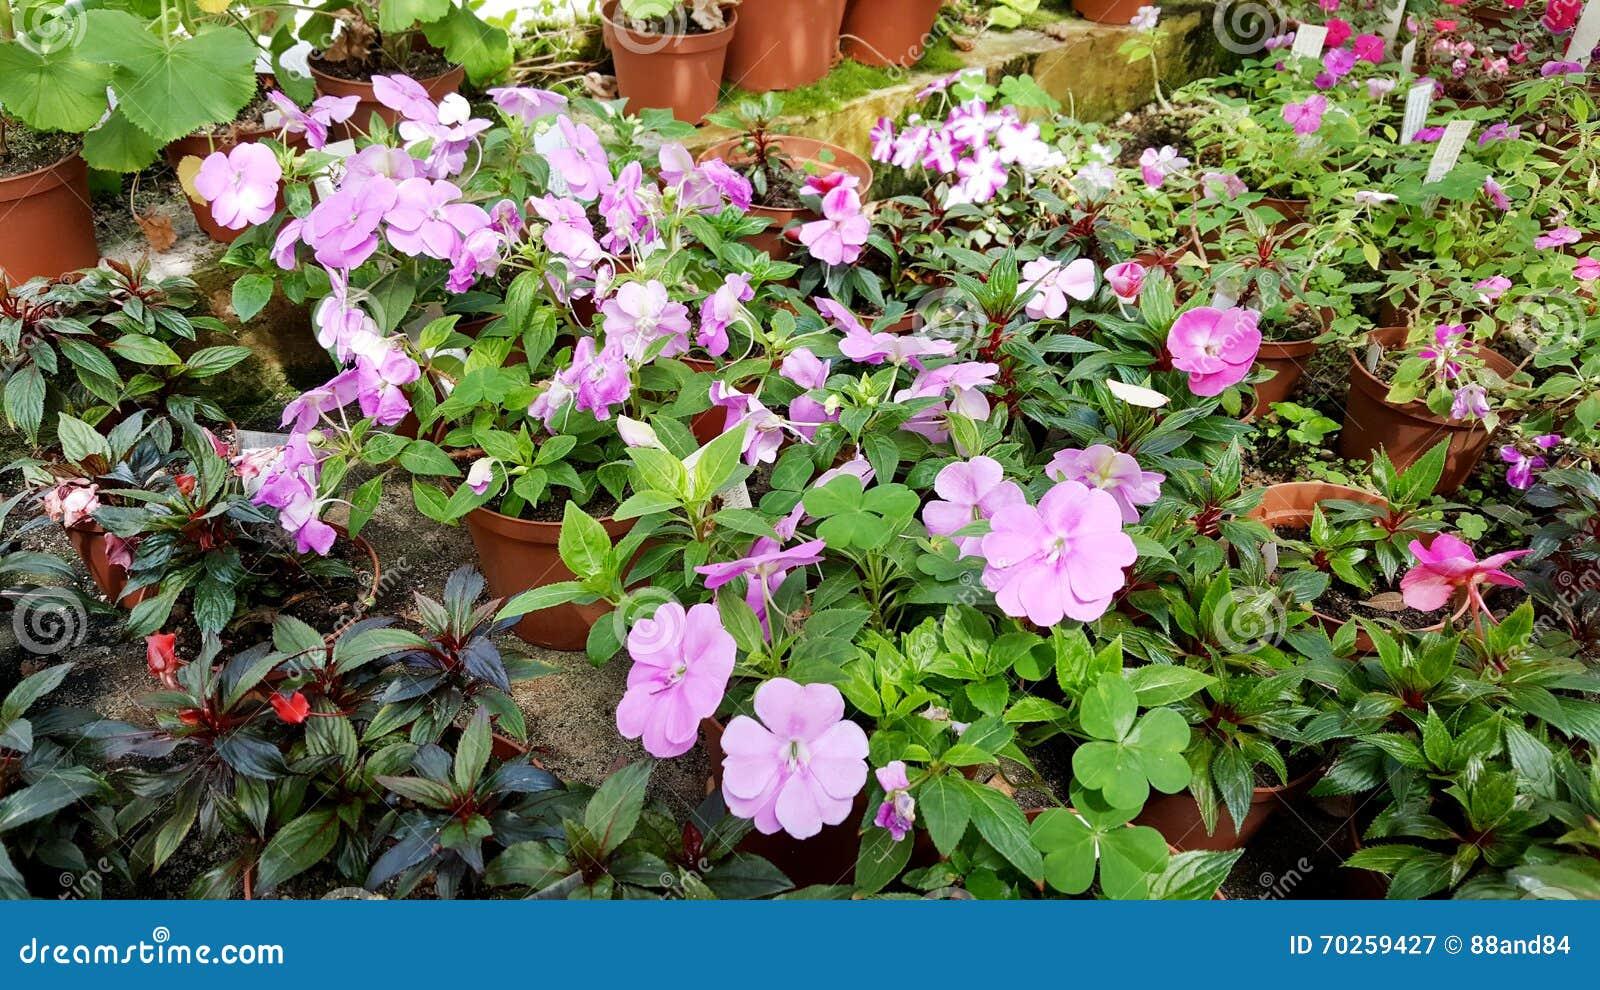 New Guinea Hybrid Impatiens Flowers Stock Image